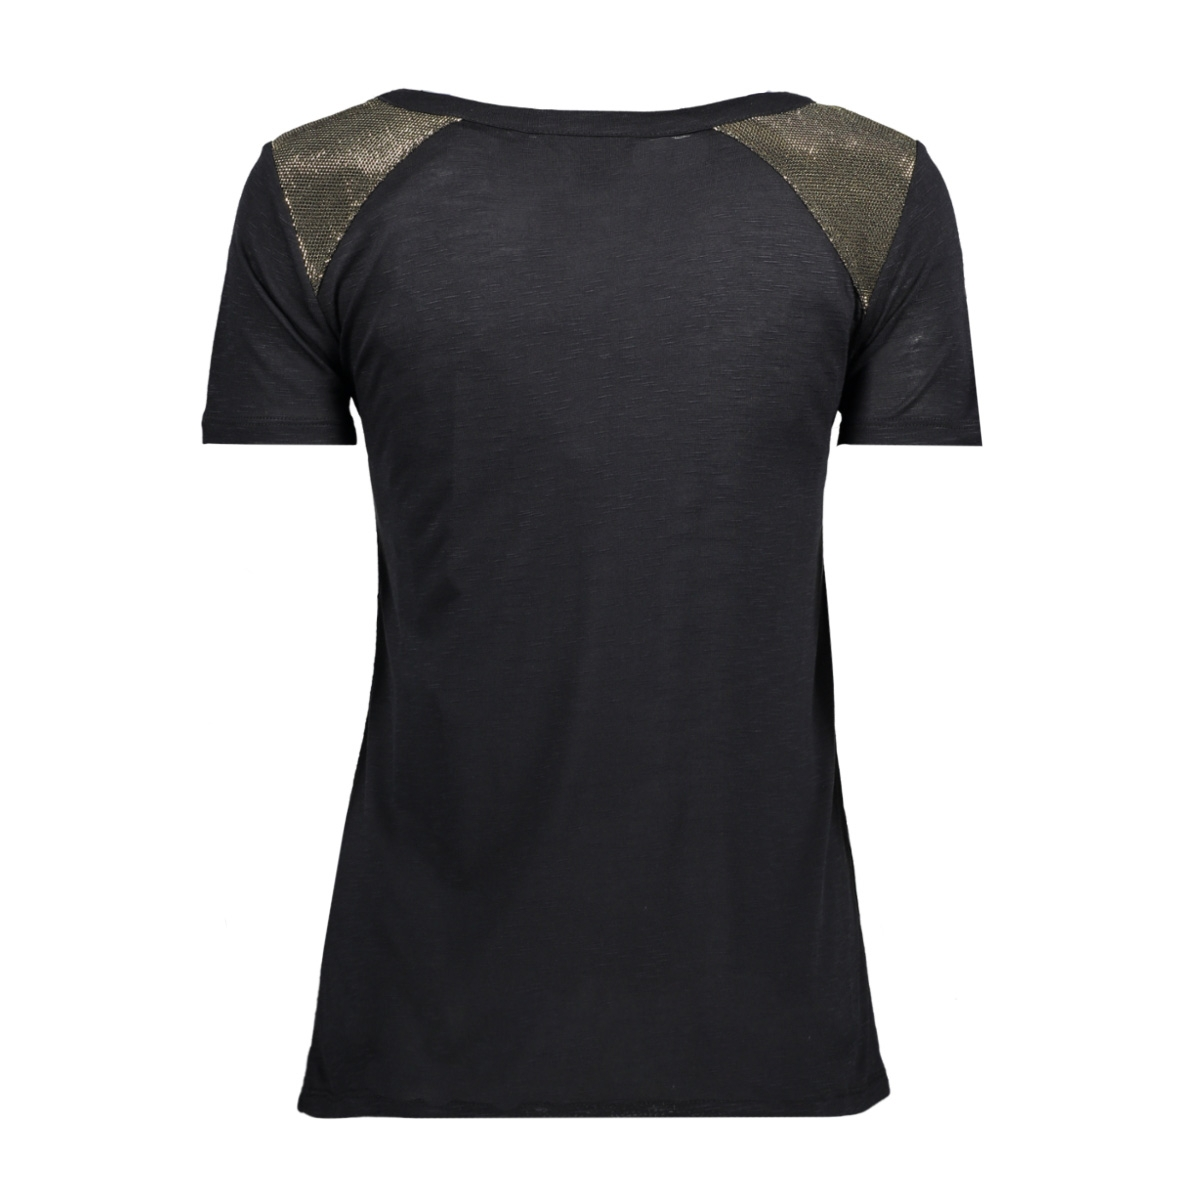 1039269.00.70 tom tailor t-shirt 2999